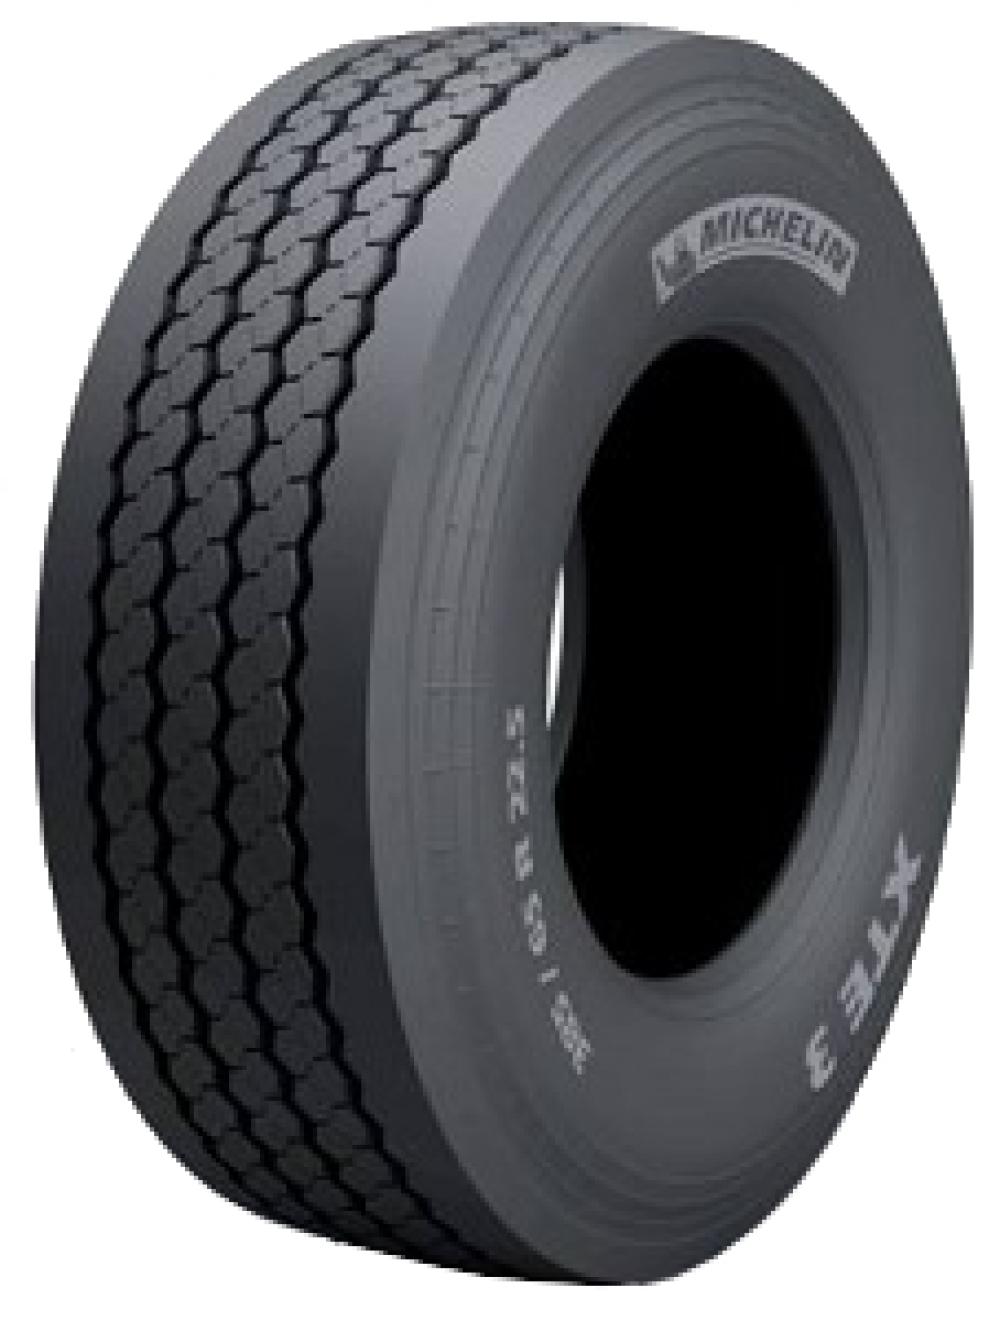 Michelin XTE 3 ( 385/65 R22.5 160J 20PR Doppelkennung 158L )